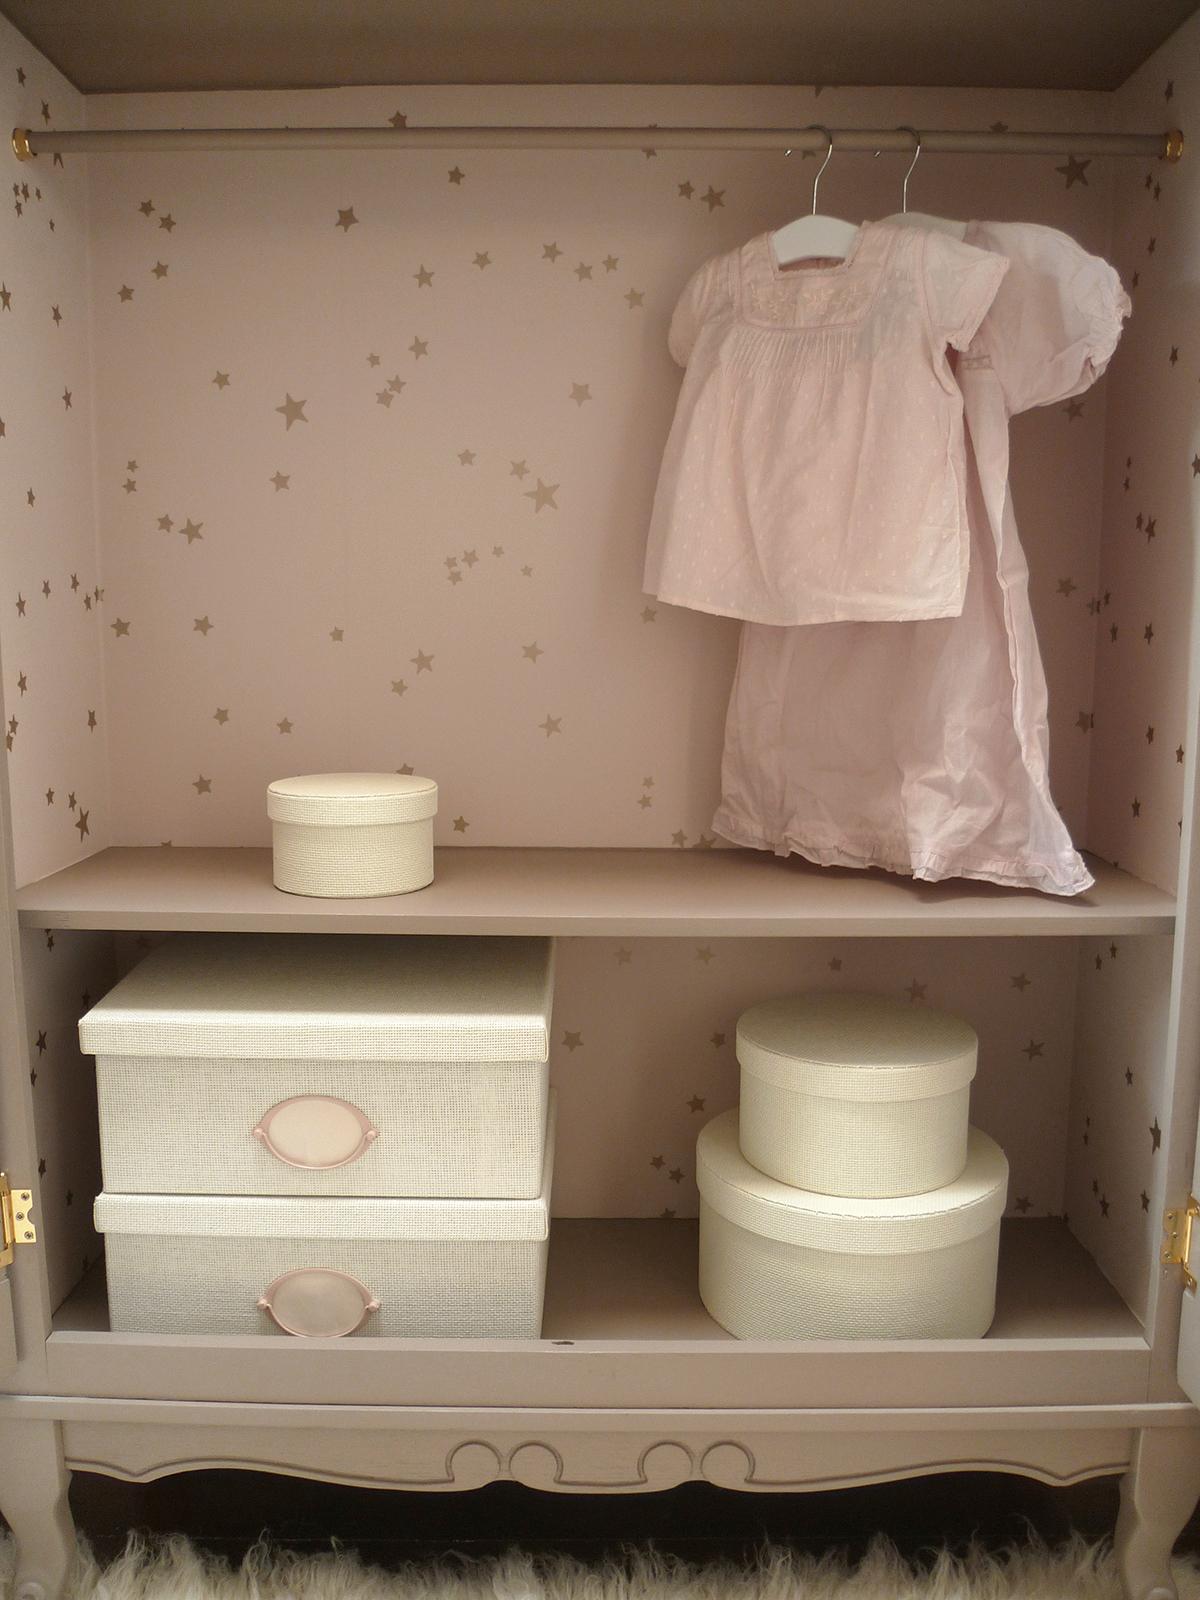 Preciously Me blog : One Room Challenge -DIY Wardrobe makeover